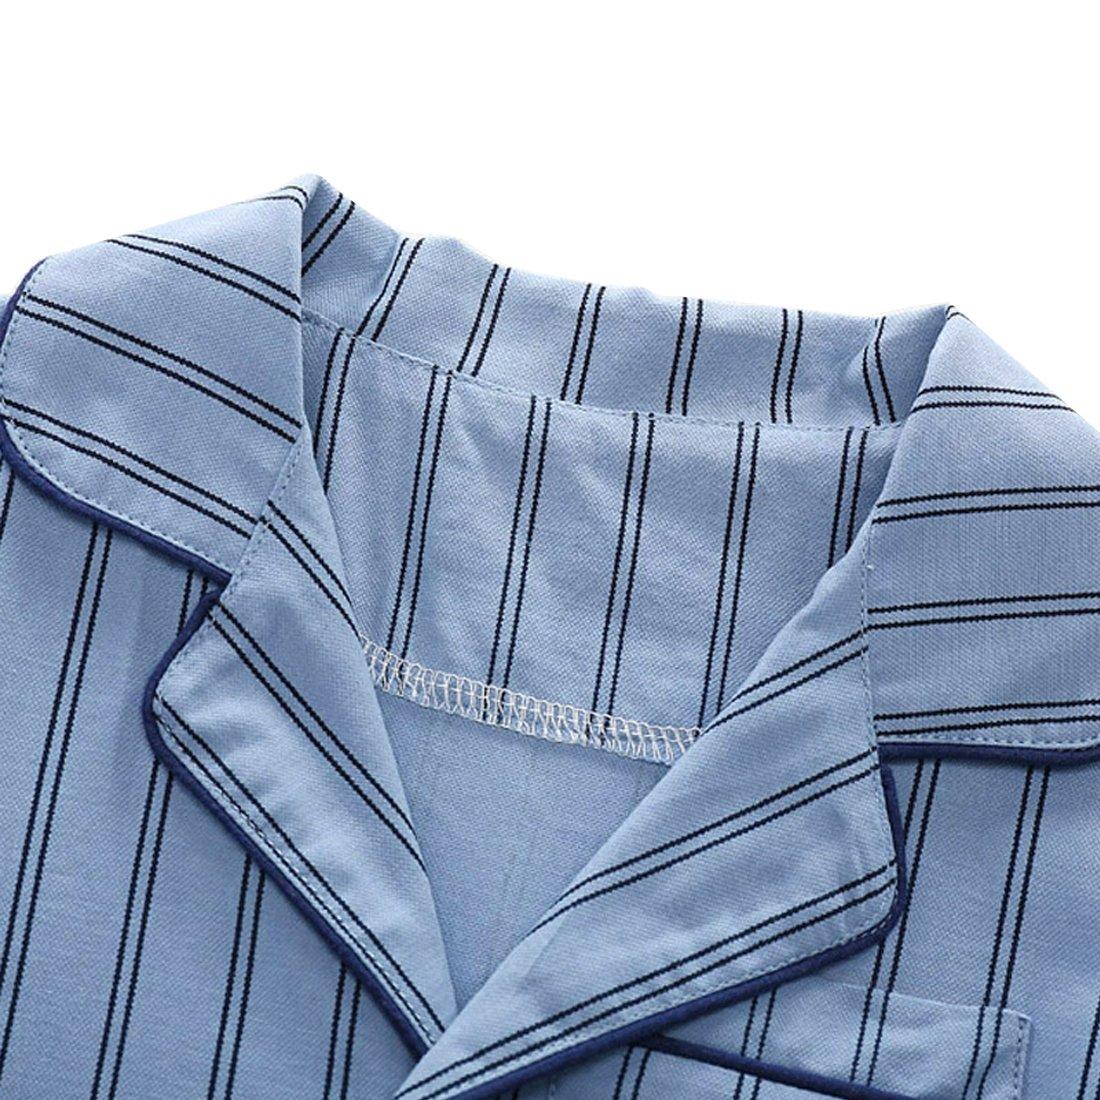 PAUBOLI Boys Button Down Pajamas Set Short Sleeve Organic Cotton Striped Sleepwear Loungewear (6-7 Years) by PAUBOLI (Image #2)